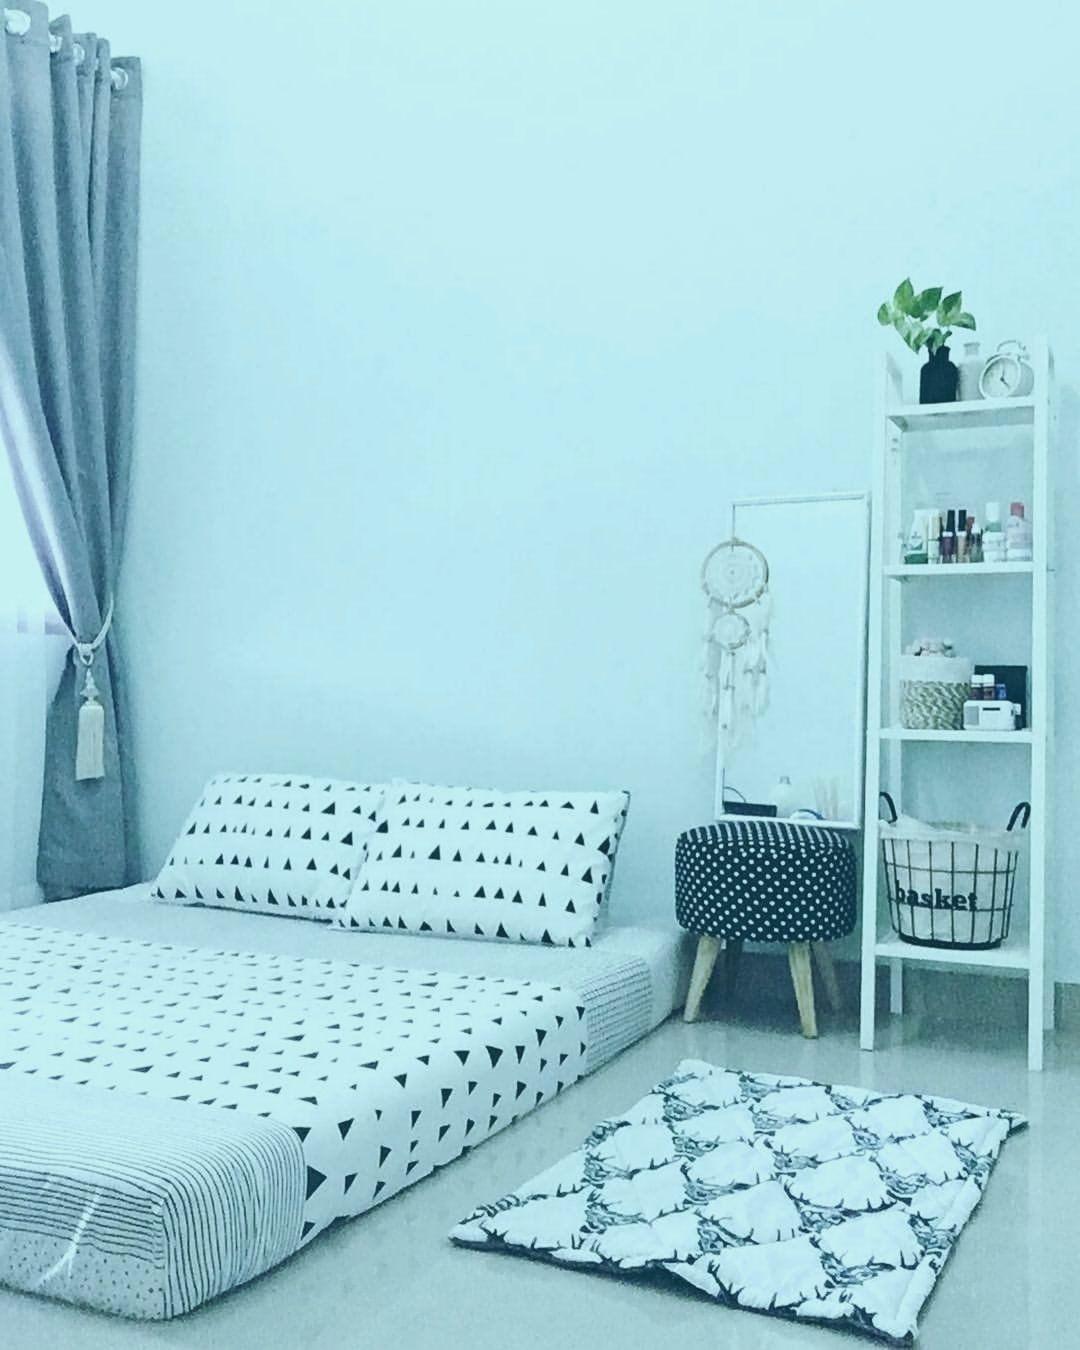 Udealing Online Store Small Bedroom Decor Bedroom Decor Small Room Bedroom Inspirasi blue bedroom decor